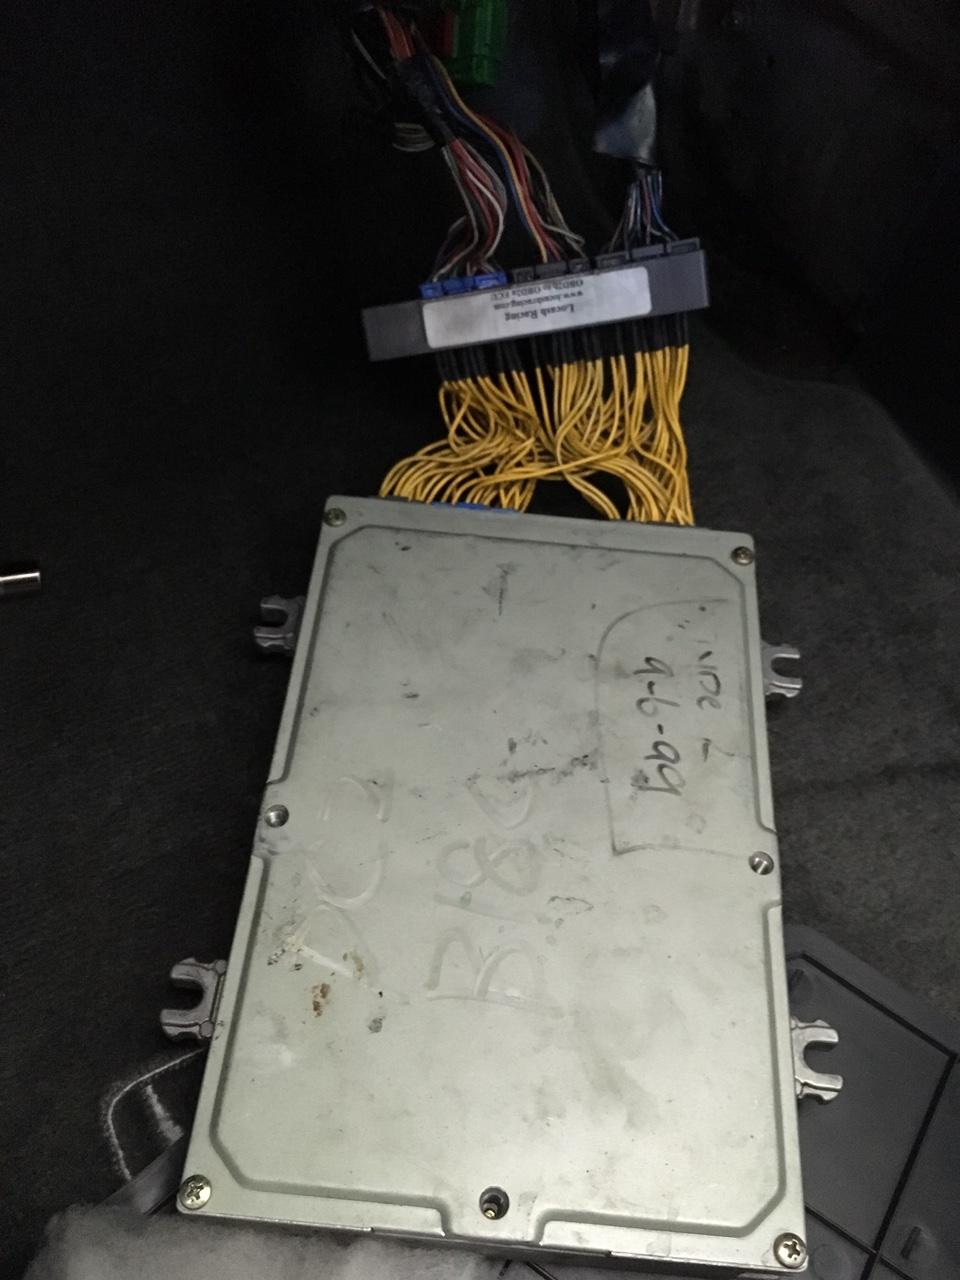 How To Jdm Itr Motor Into Usdm Chassis No Cel Smog Inspection Rywire Ecu Diagram Image